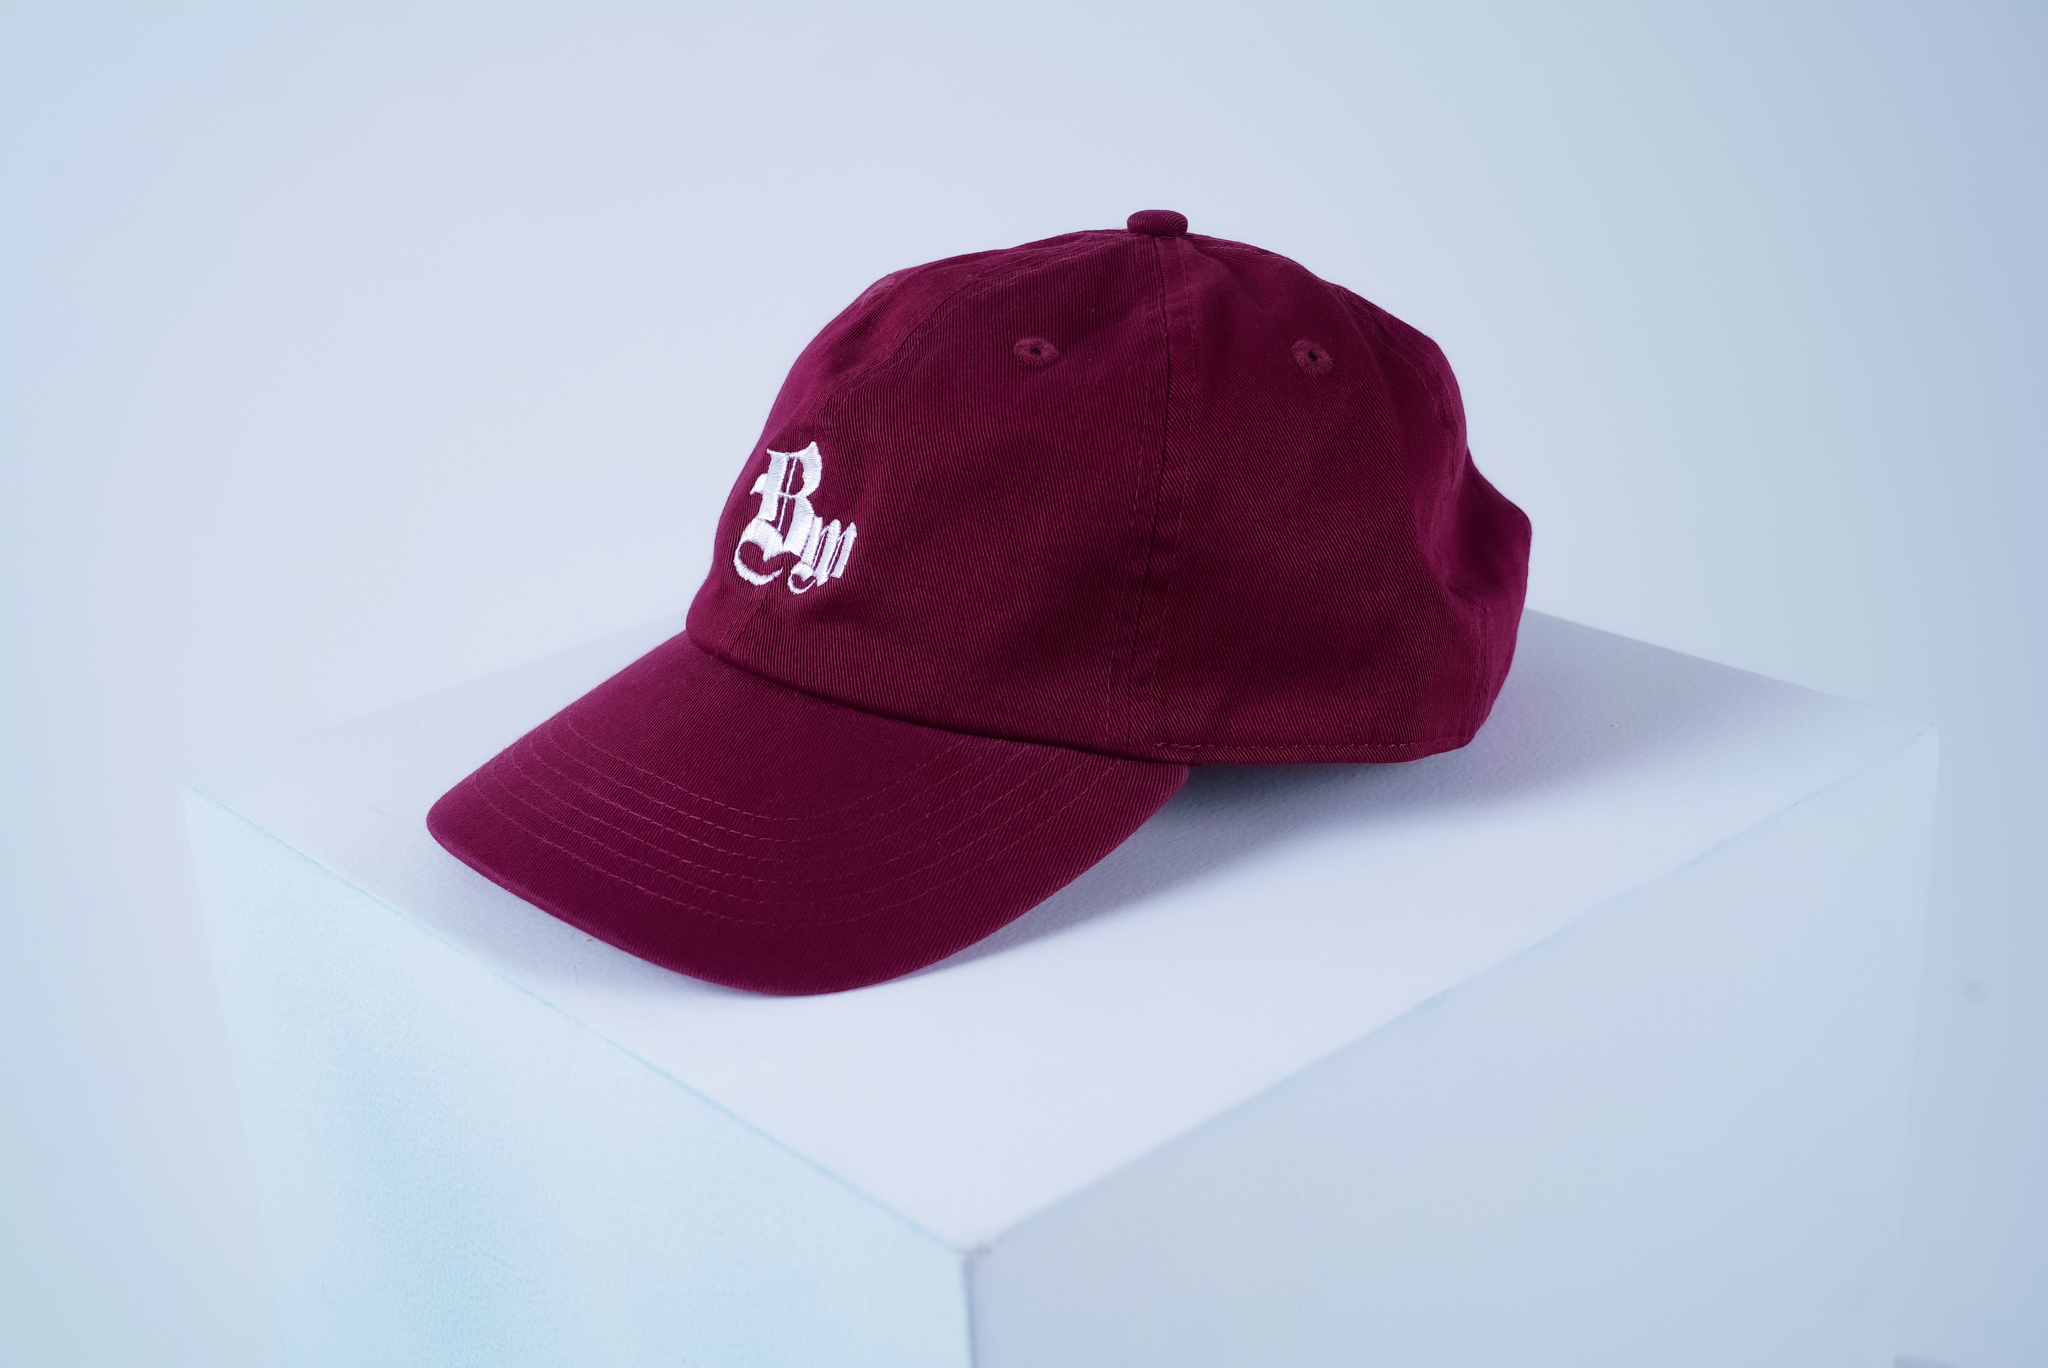 BW COTTON CAP [WINE]